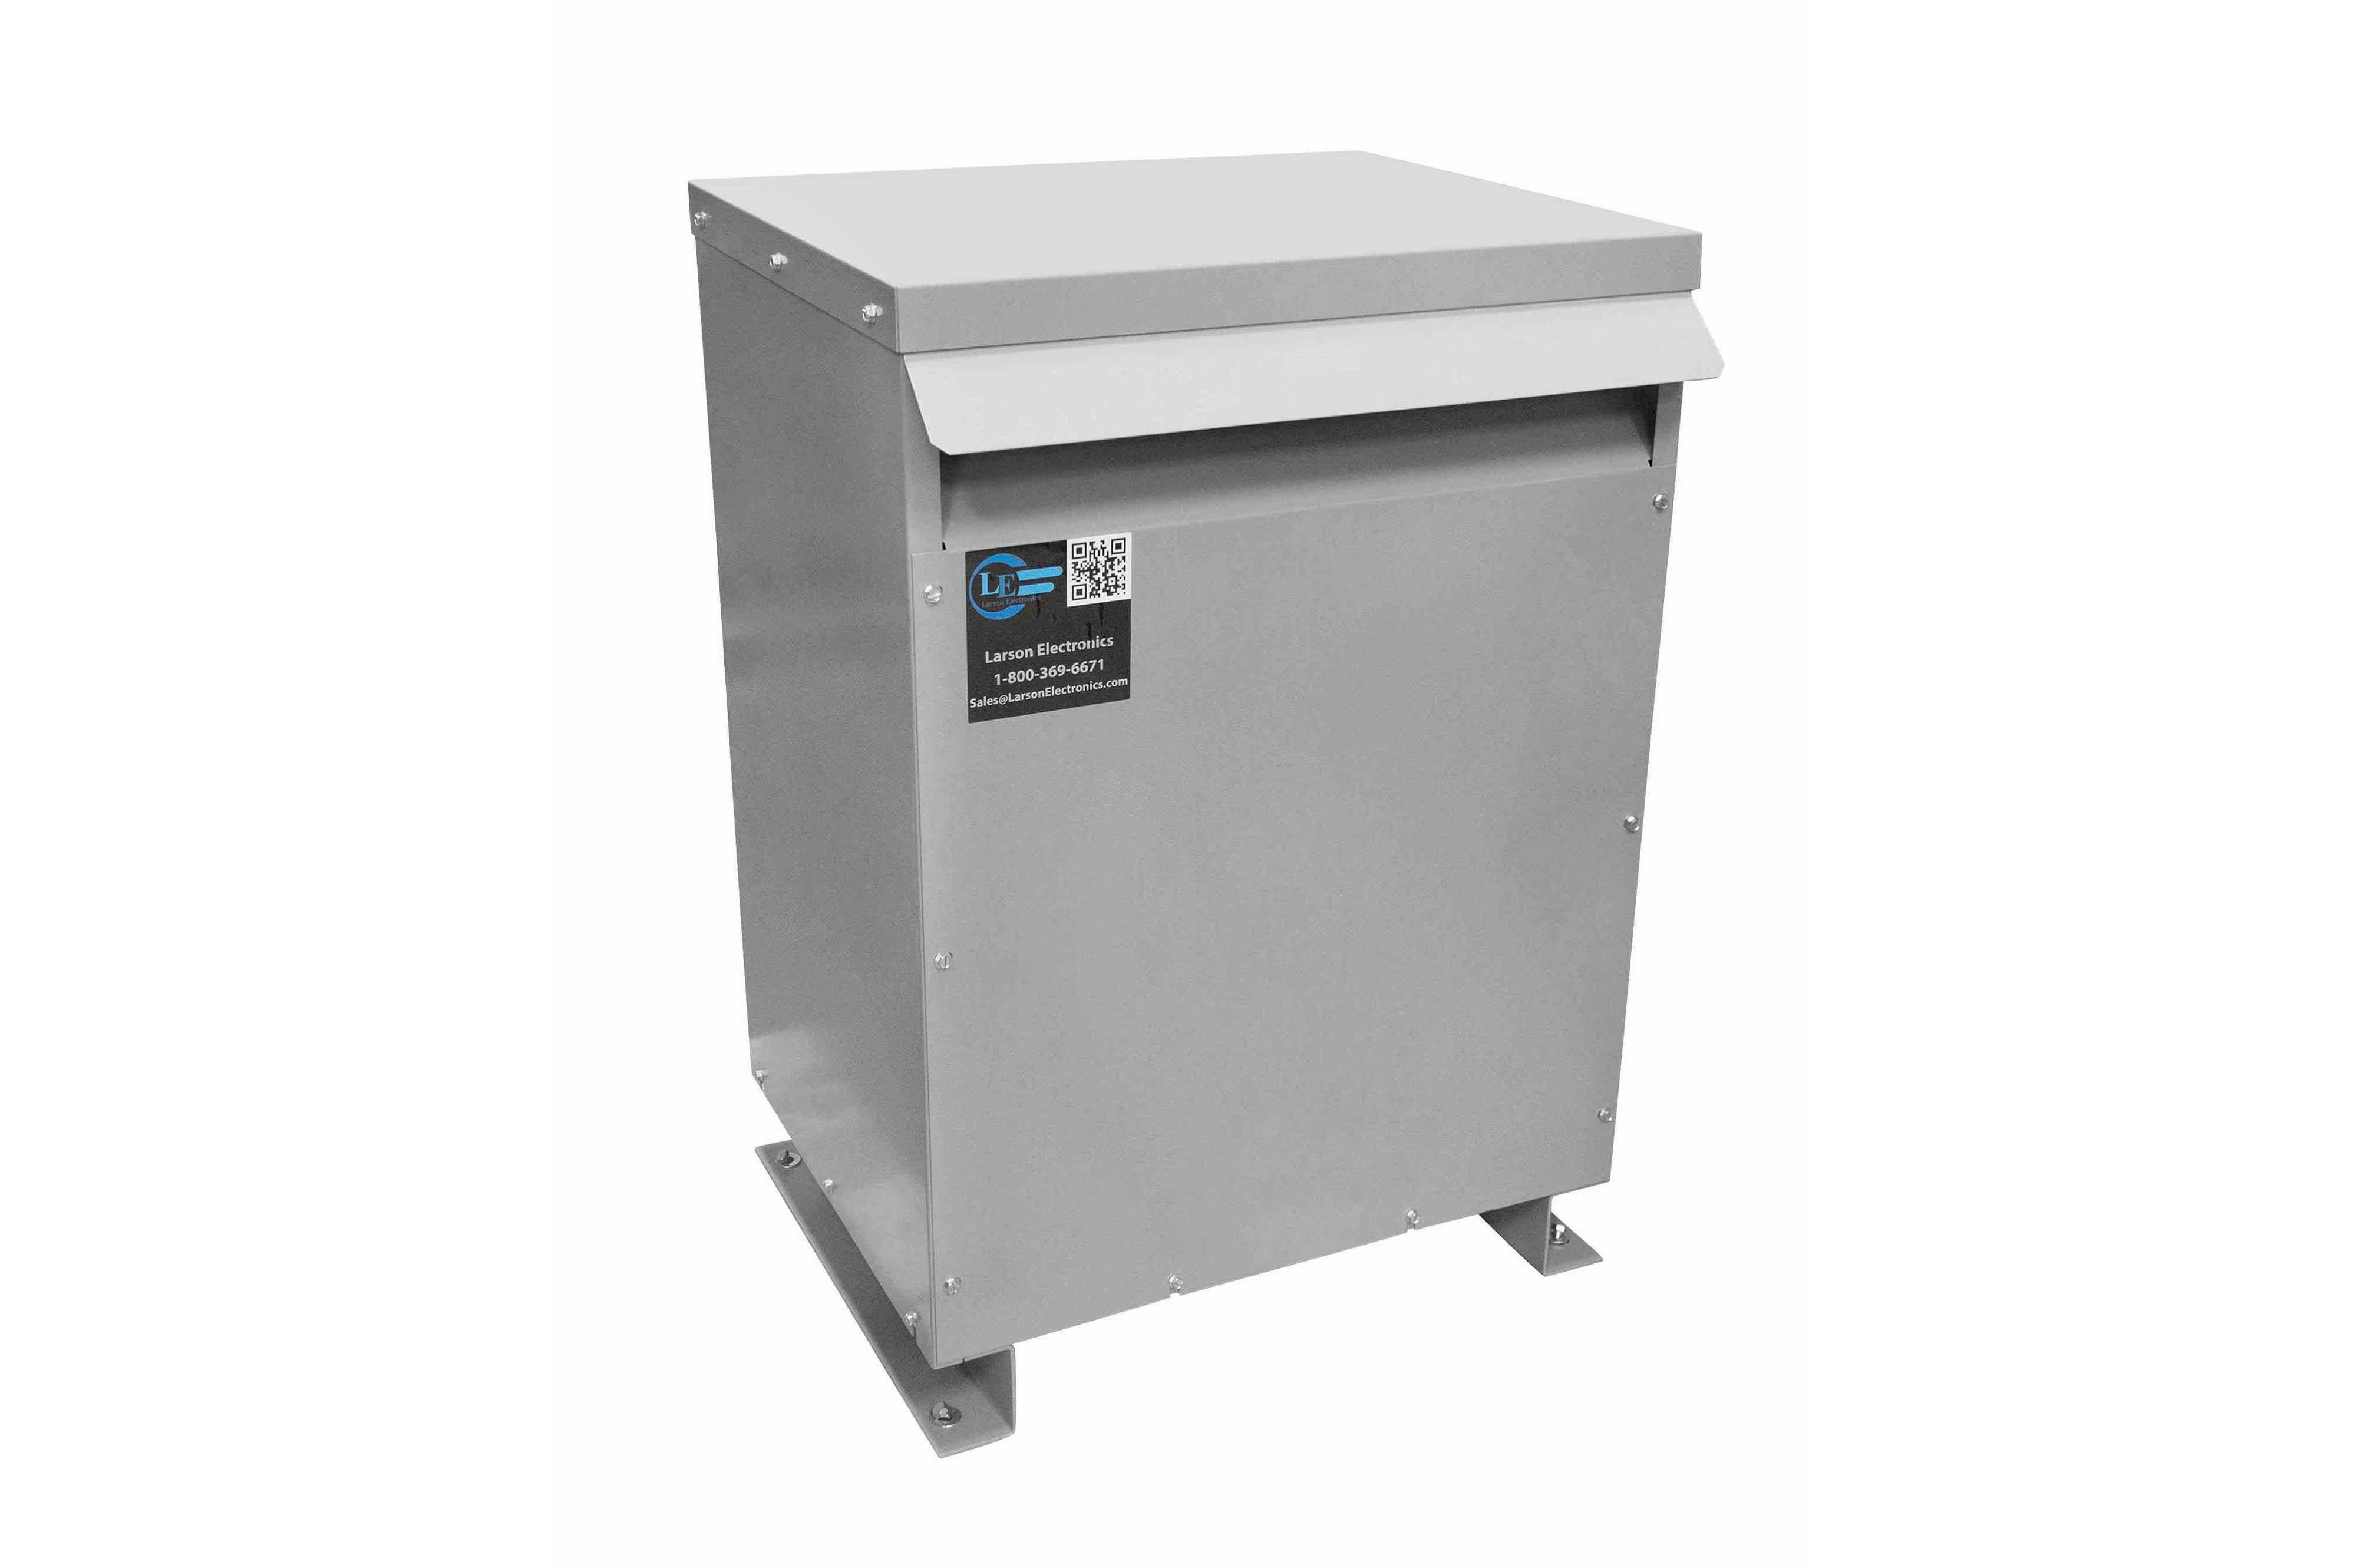 80 kVA 3PH Isolation Transformer, 460V Wye Primary, 380V Delta Secondary, N3R, Ventilated, 60 Hz